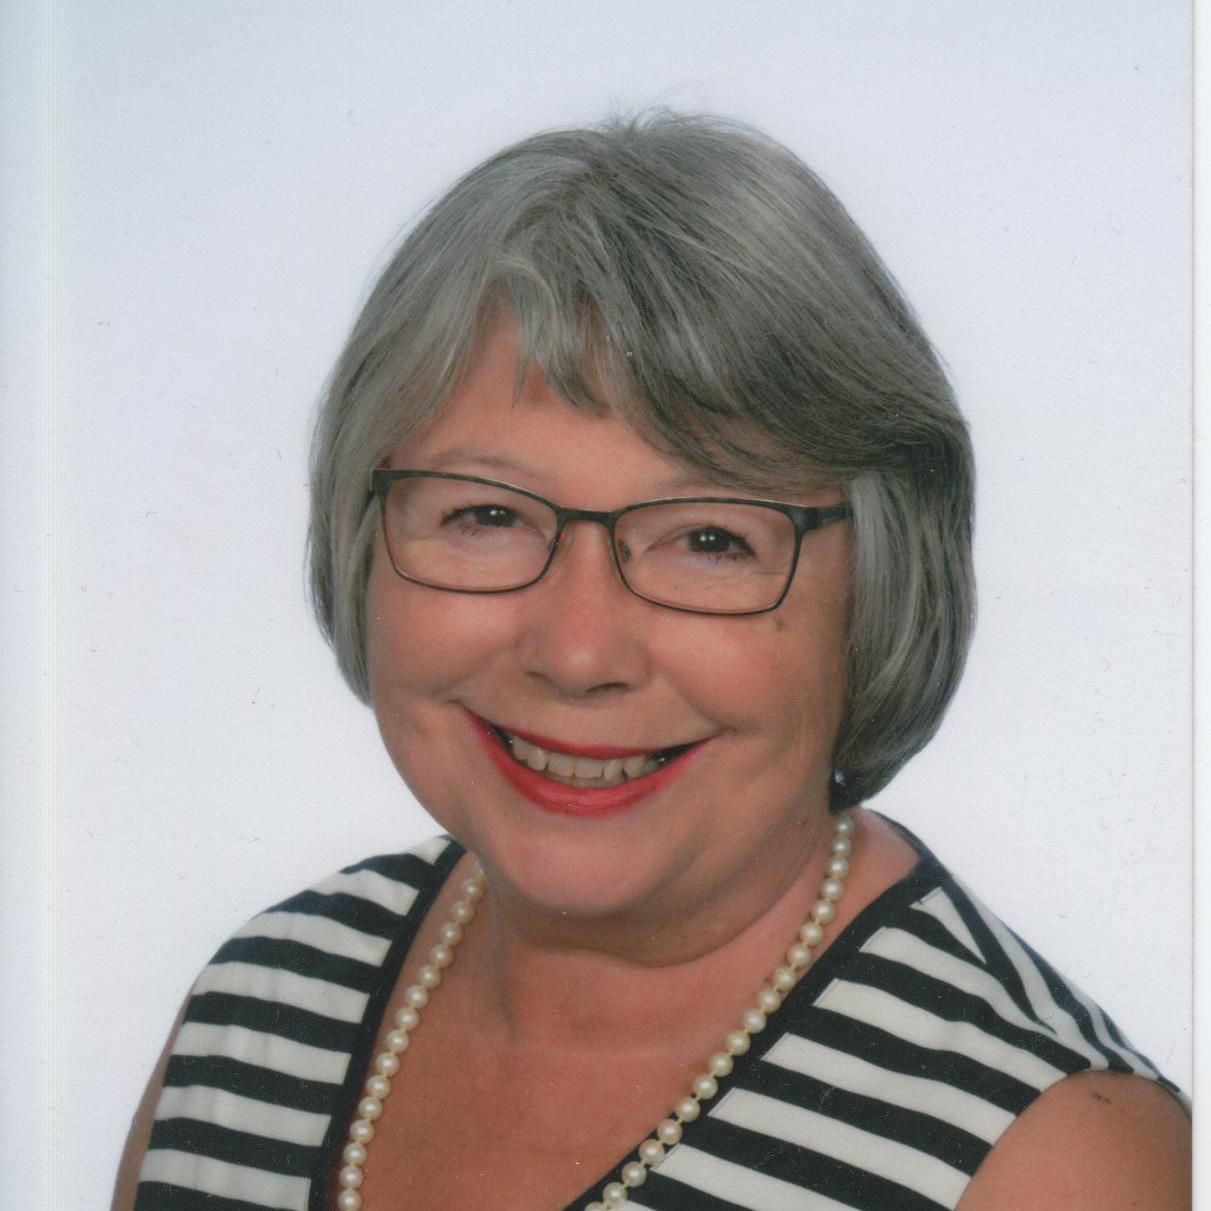 Elisabeth Artner-Peil